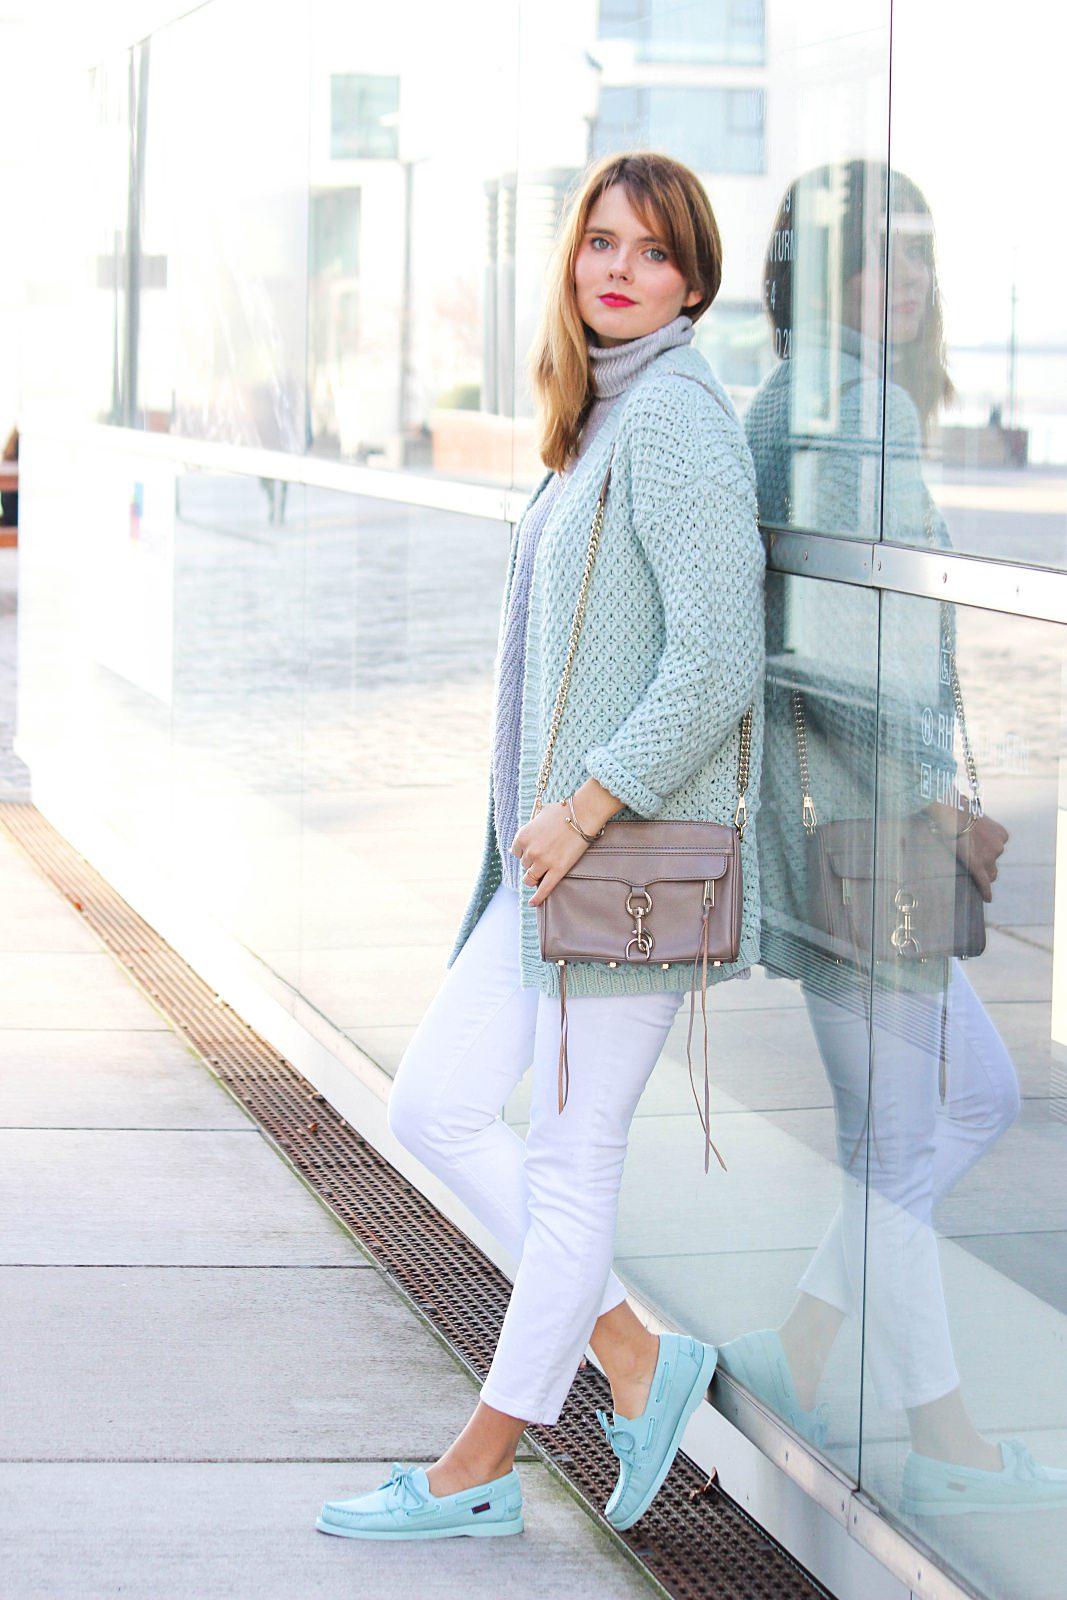 desbelleschoses-outfit-oversized-knit-in-pastellfarben-sebago-docksides-rebecca-minkoff-mini-mac 2